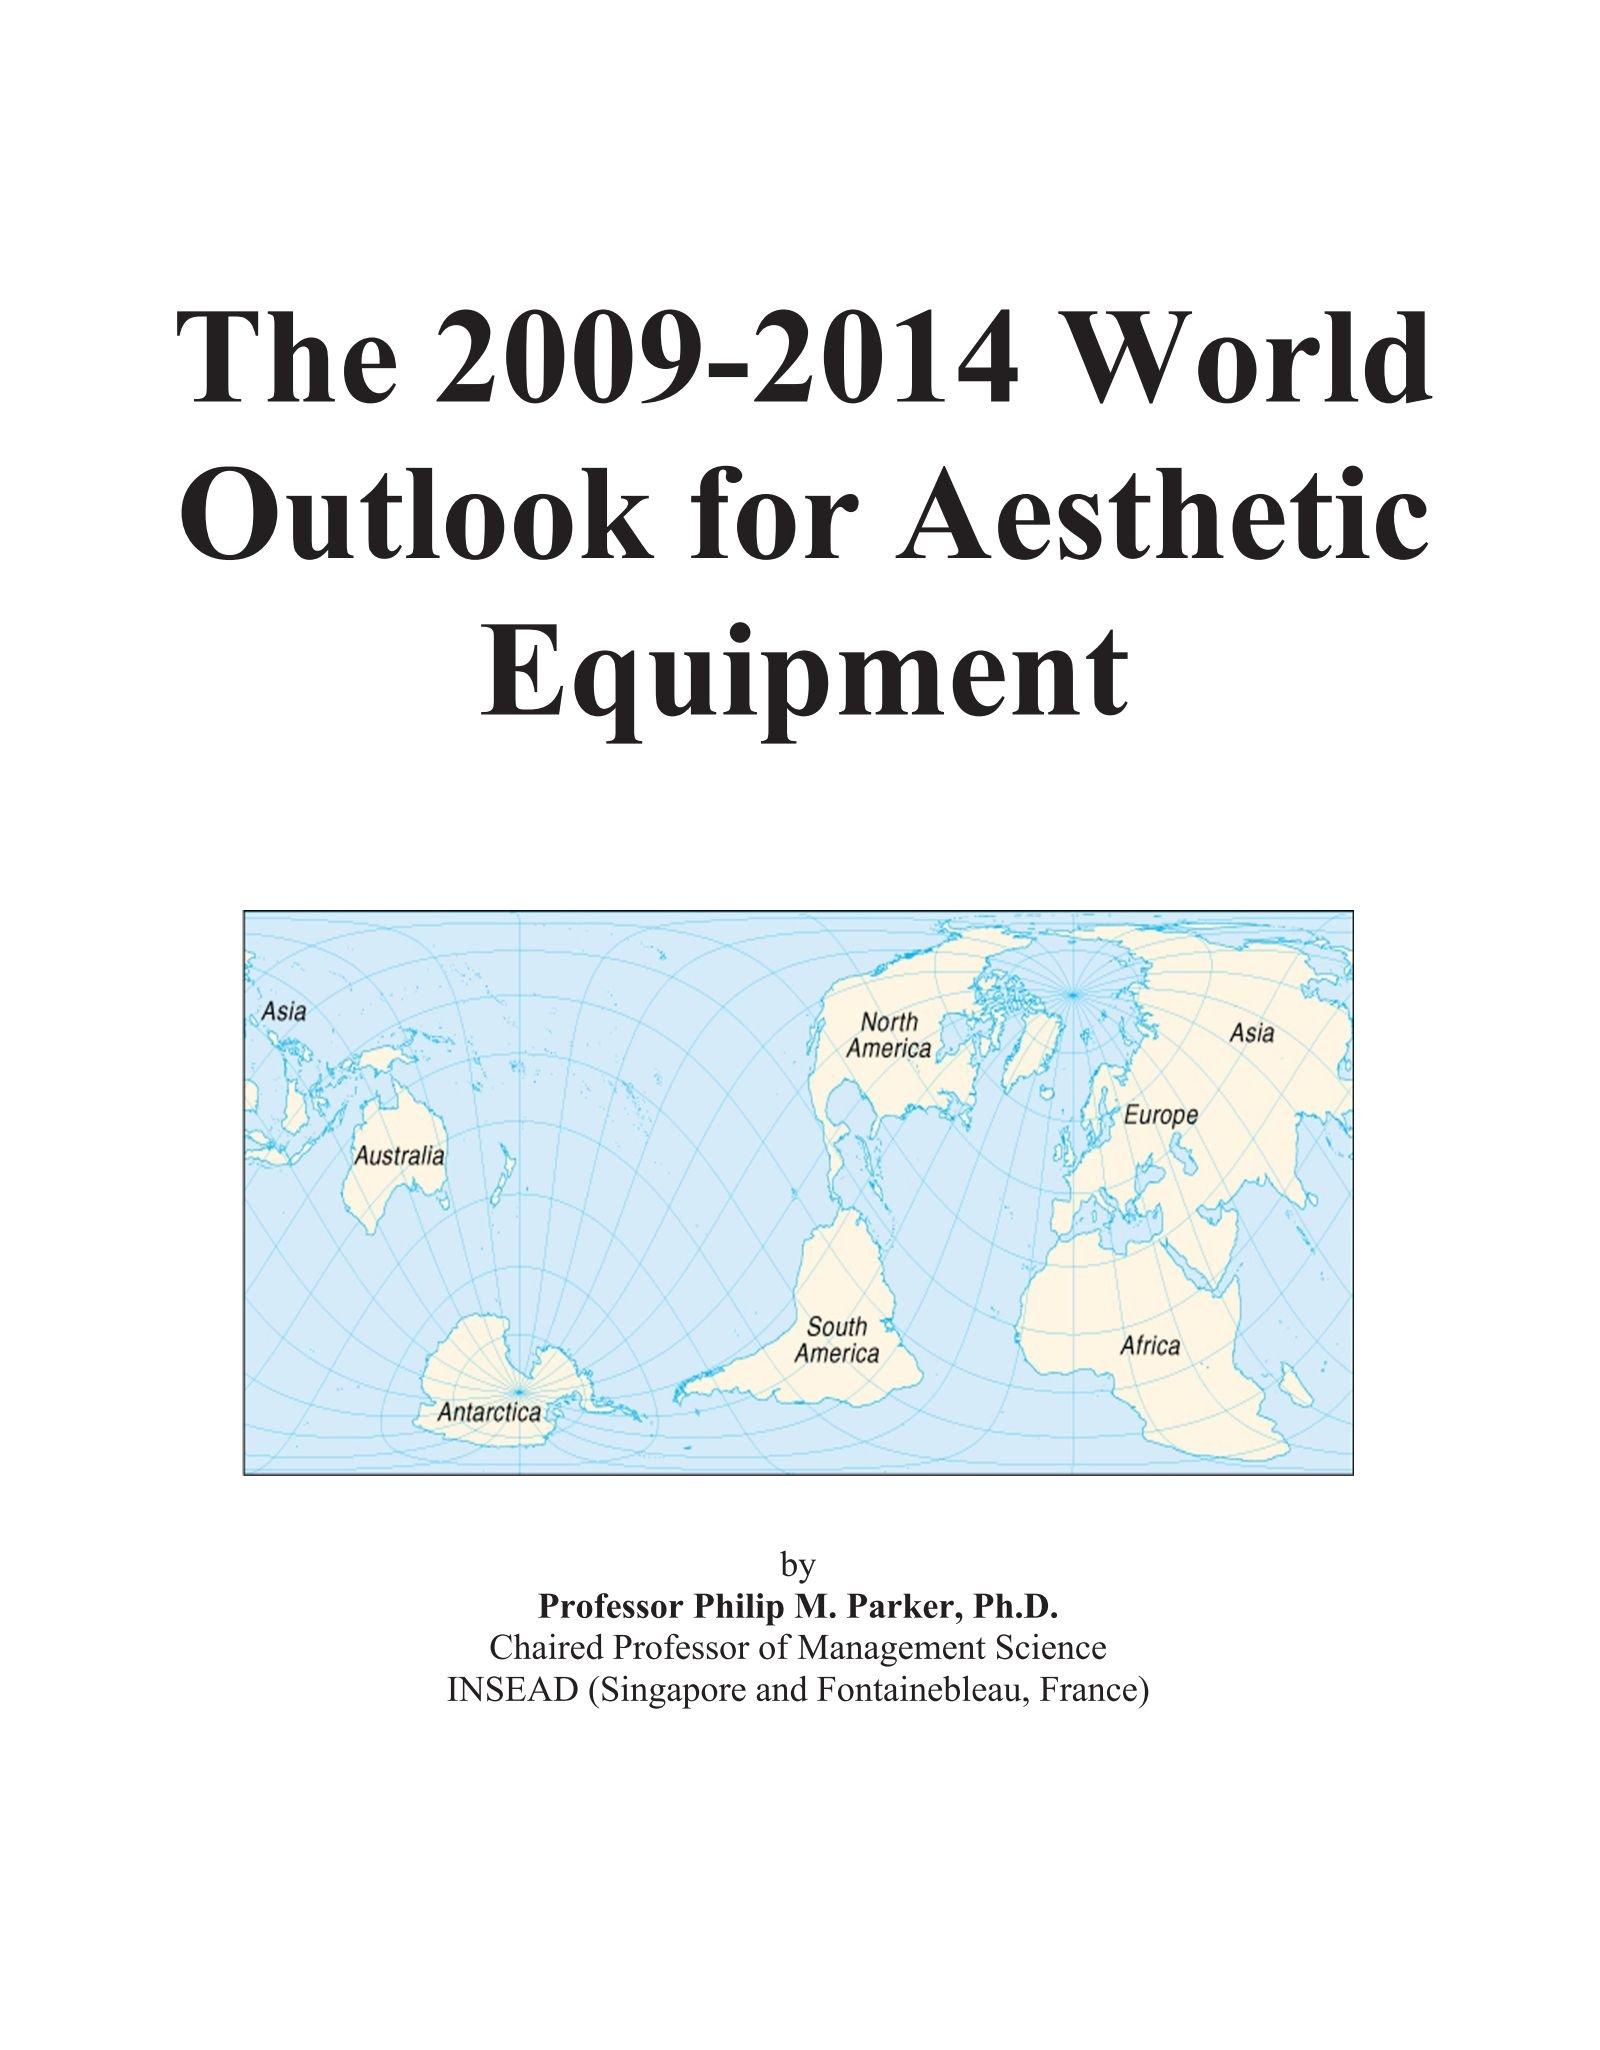 The 2009-2014 World Outlook for Aesthetic Equipment: Amazon